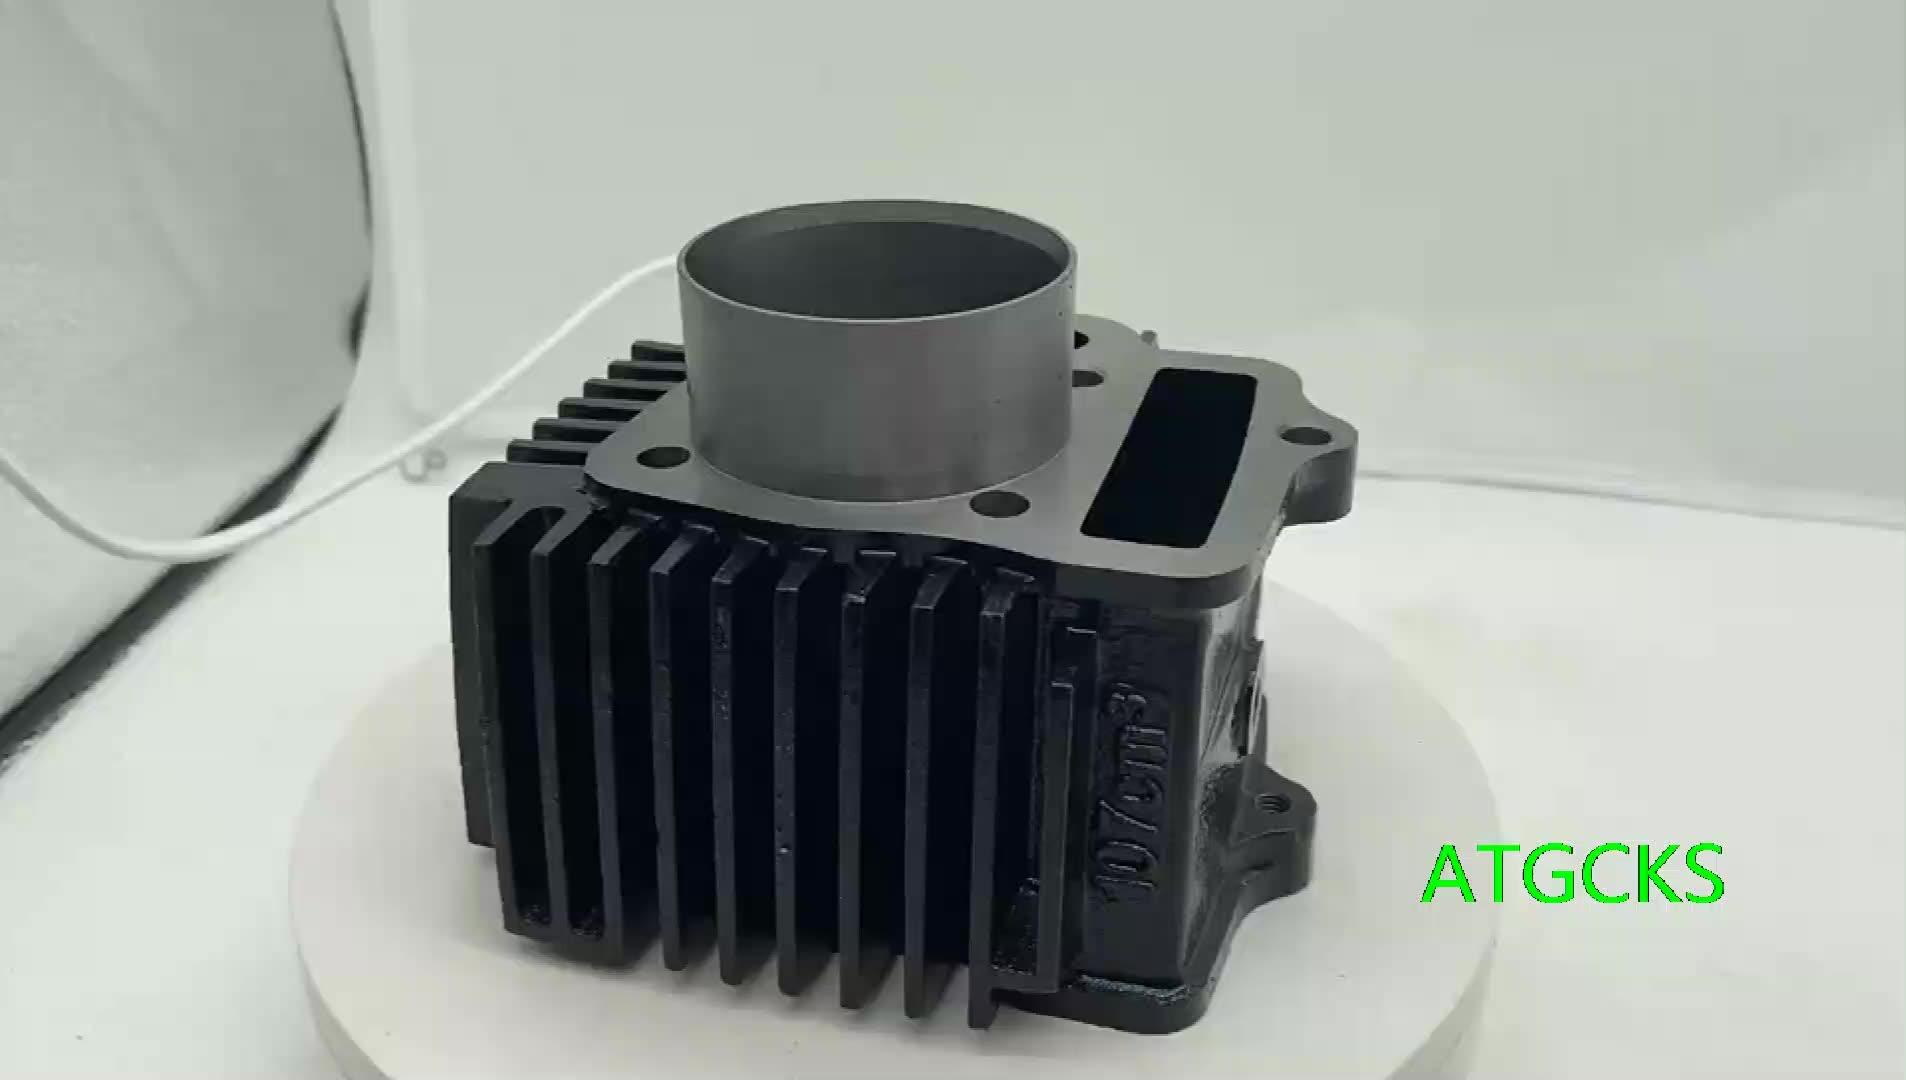 ATGCKS MOTORCYCLE BORE DIA 52.4MM C110 IRON GAS CYLINDERS